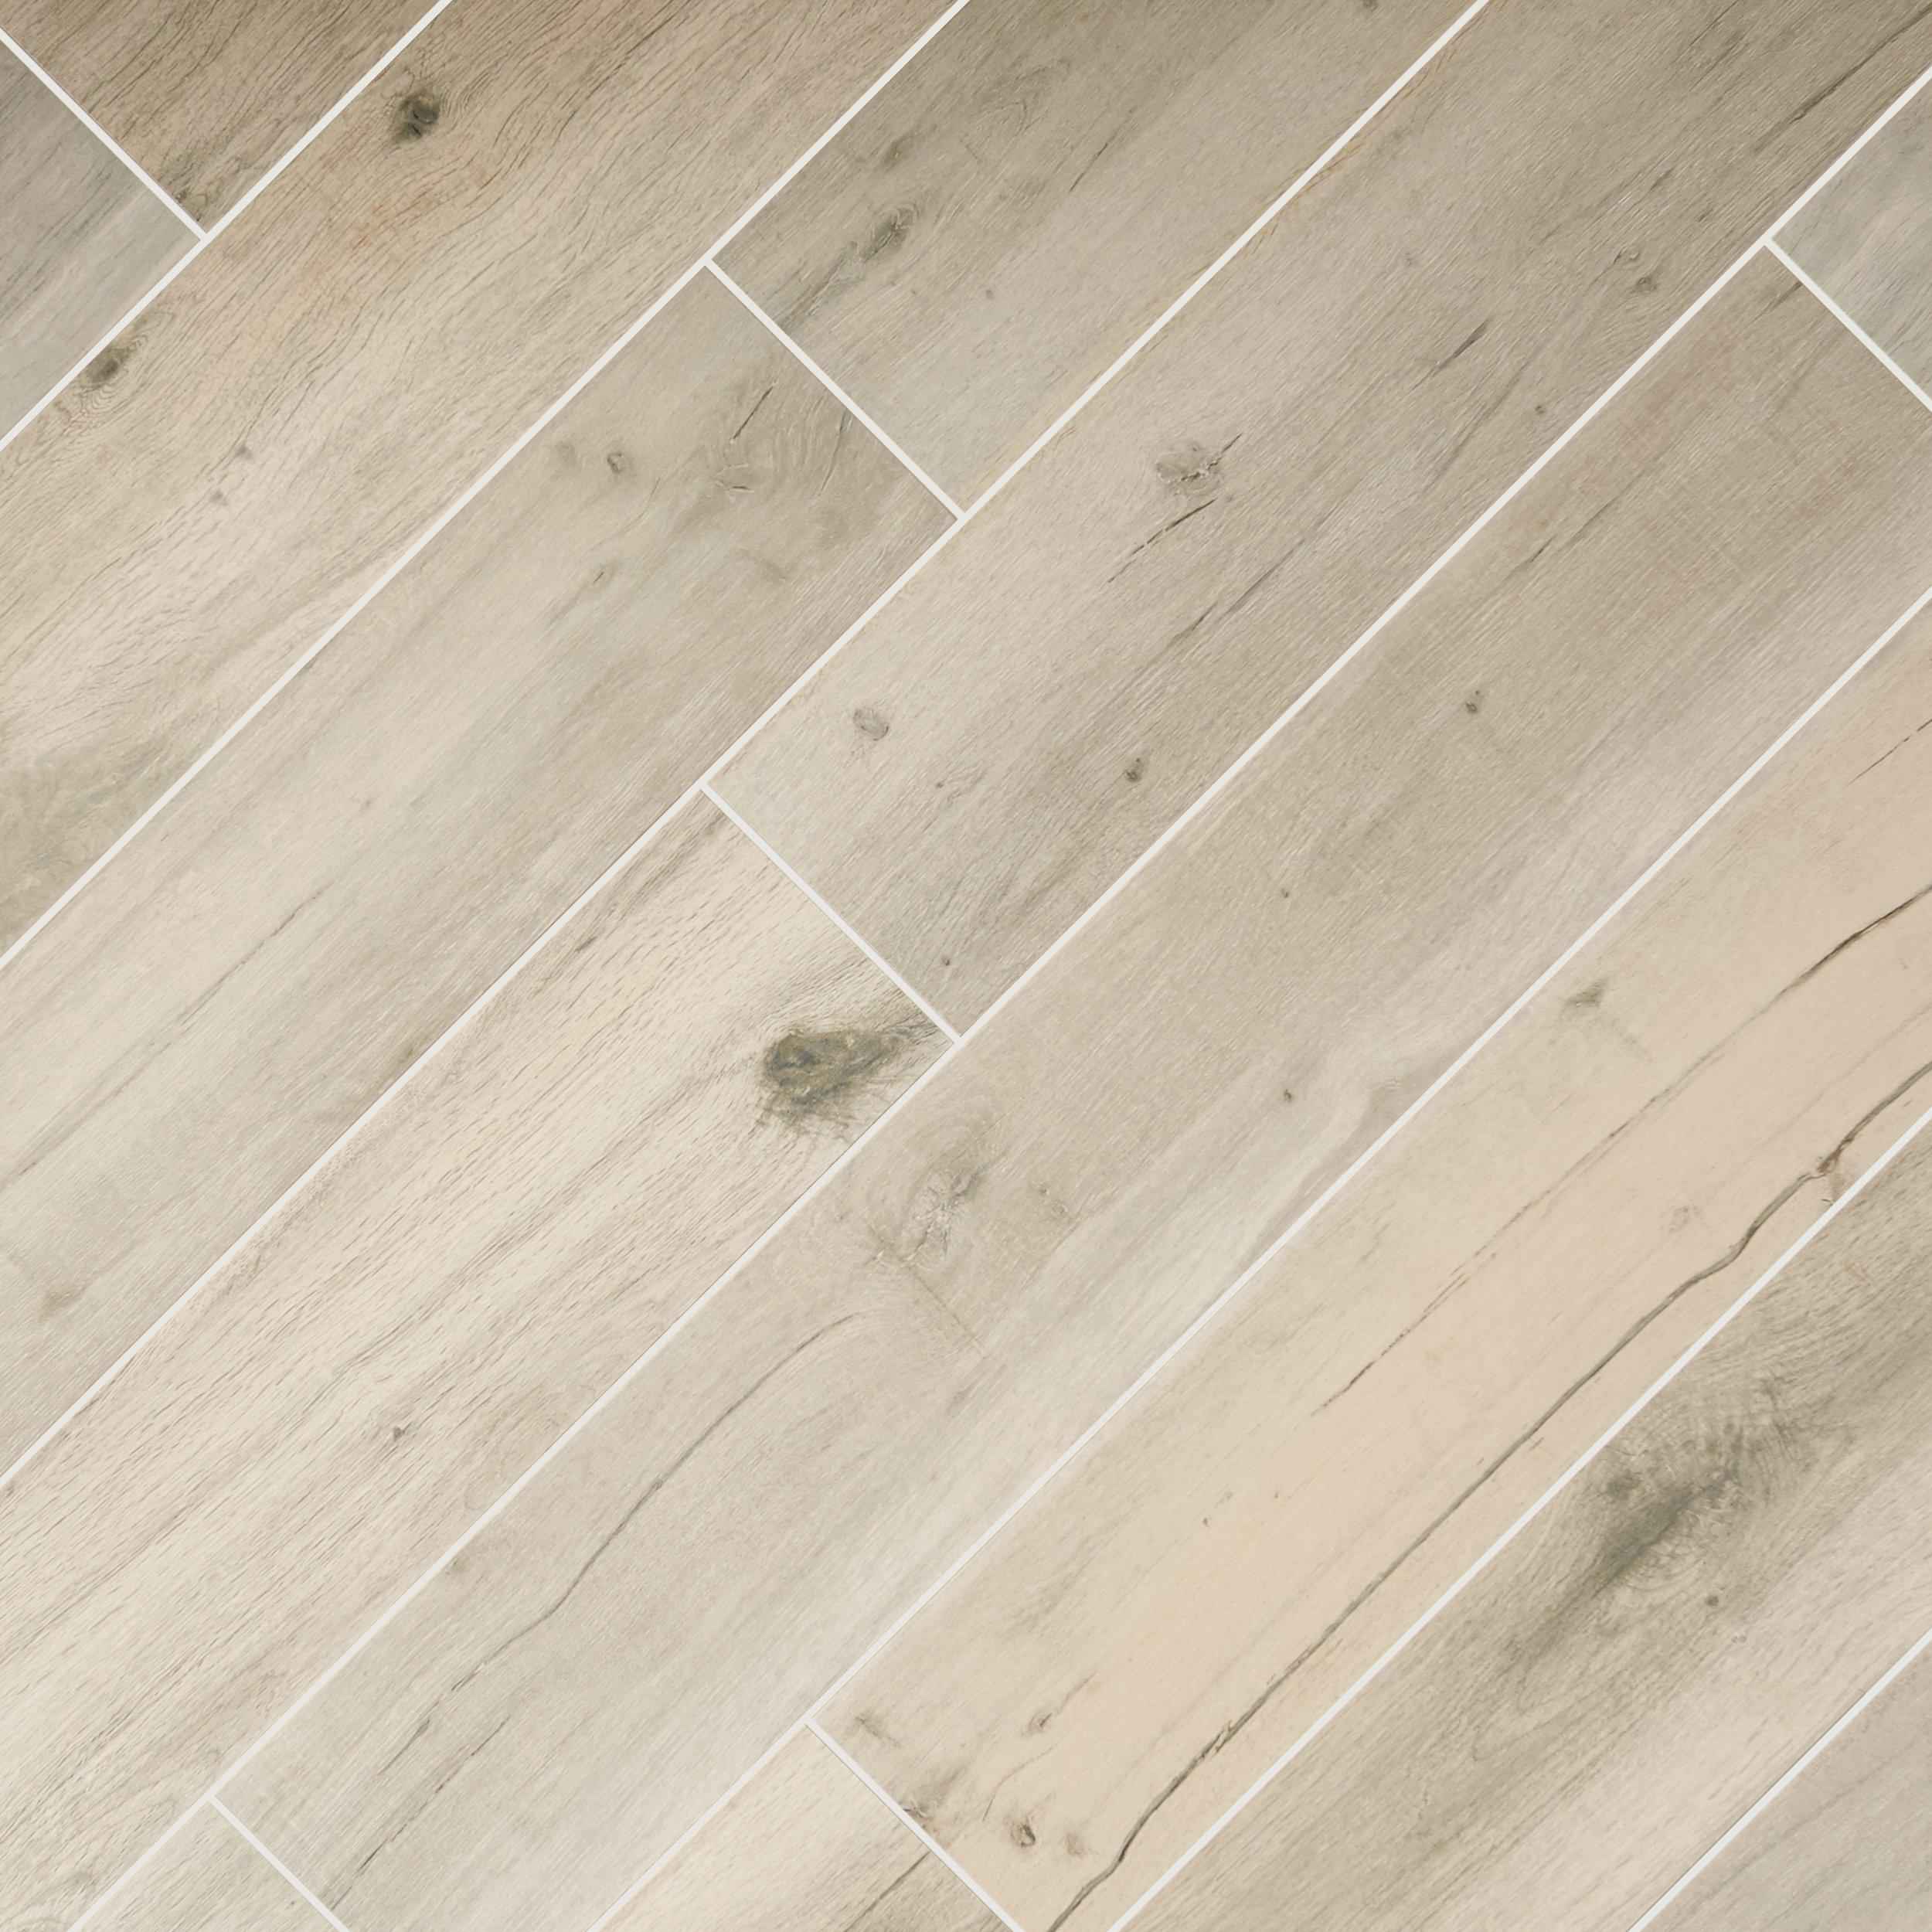 Birch Forest Gray Wood Plank Porcelain Tile